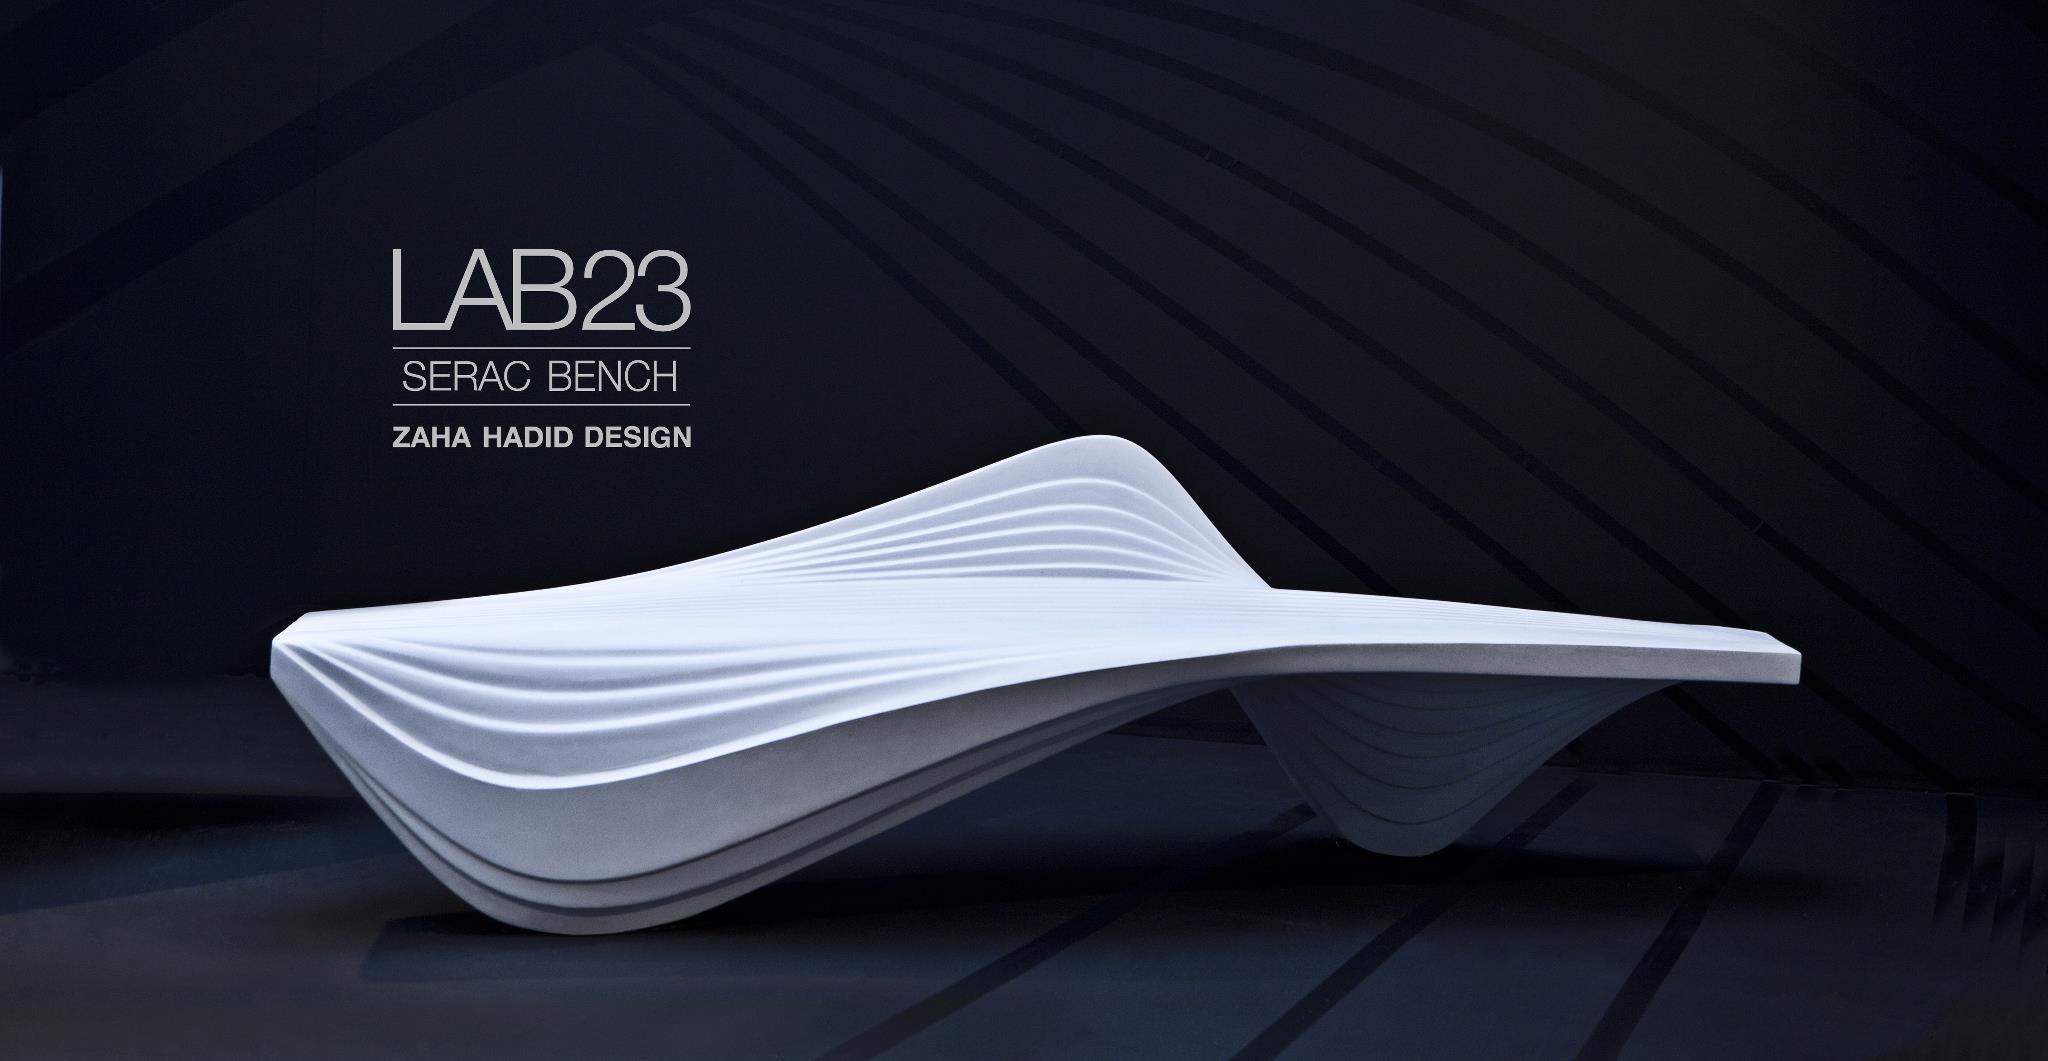 Serac bench for LAB23 by Zaha Hadid Design